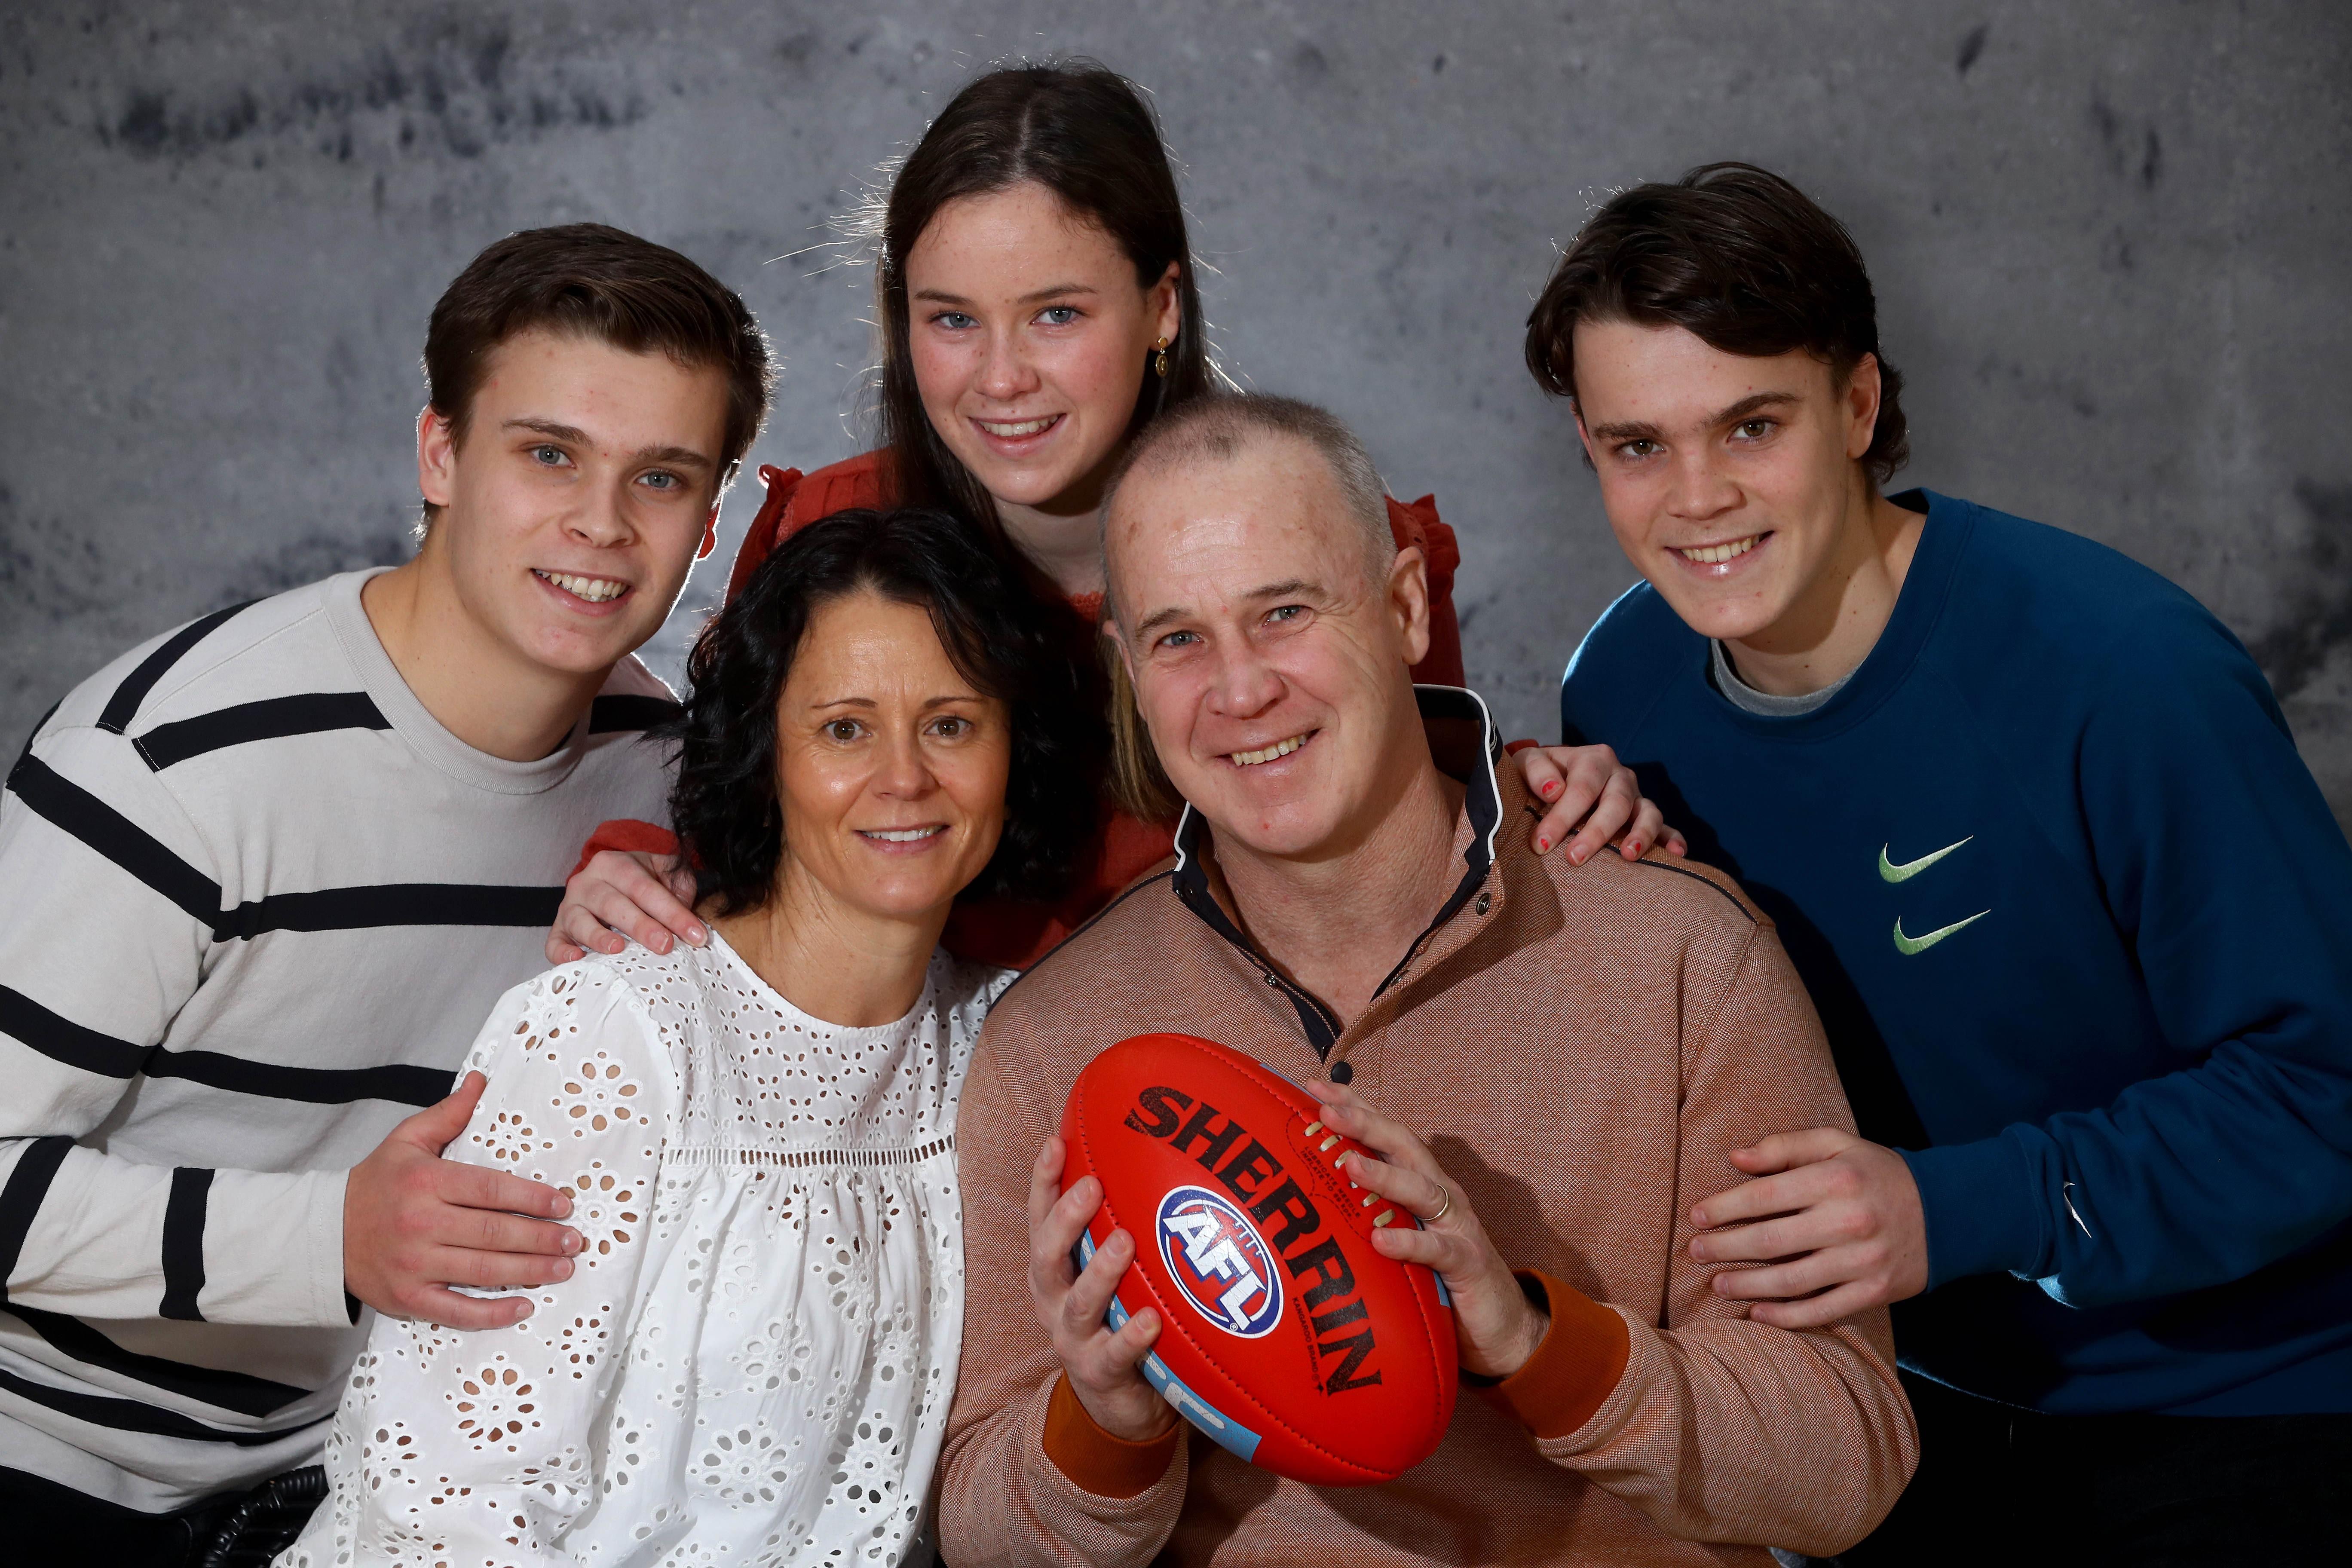 Glenn and family - photo courtesy of Geelong Advertiser